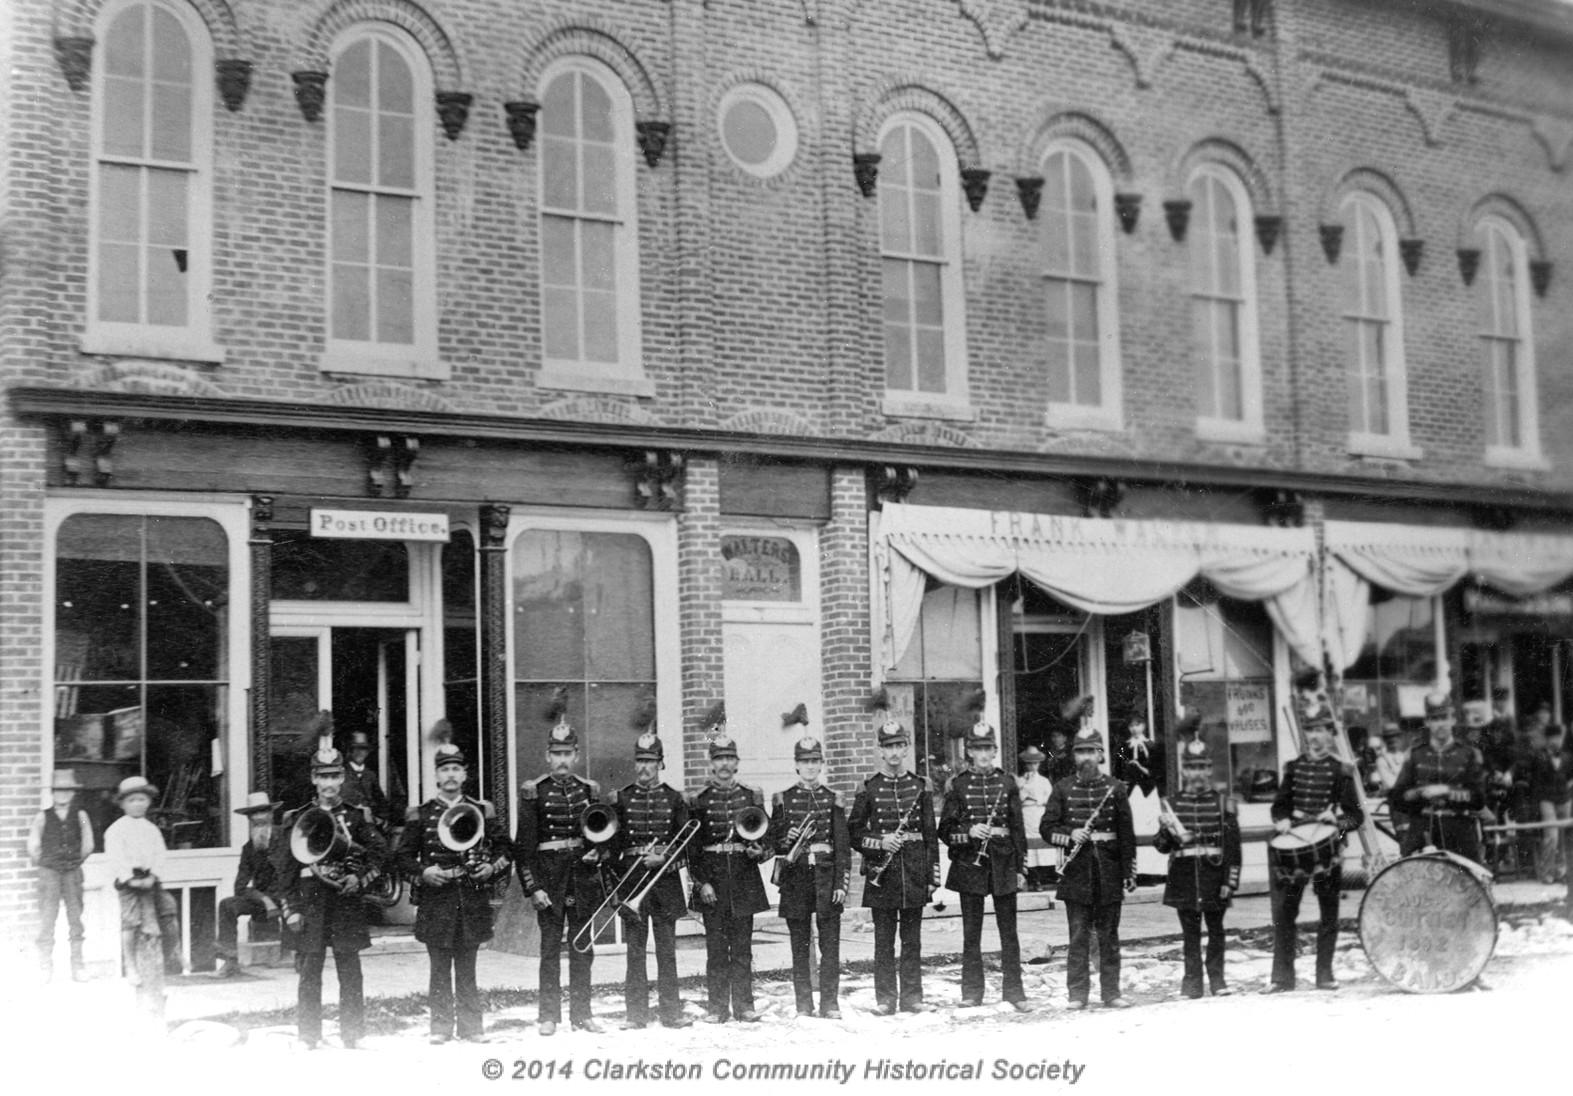 Clarkston Coronet Band, c. 1890